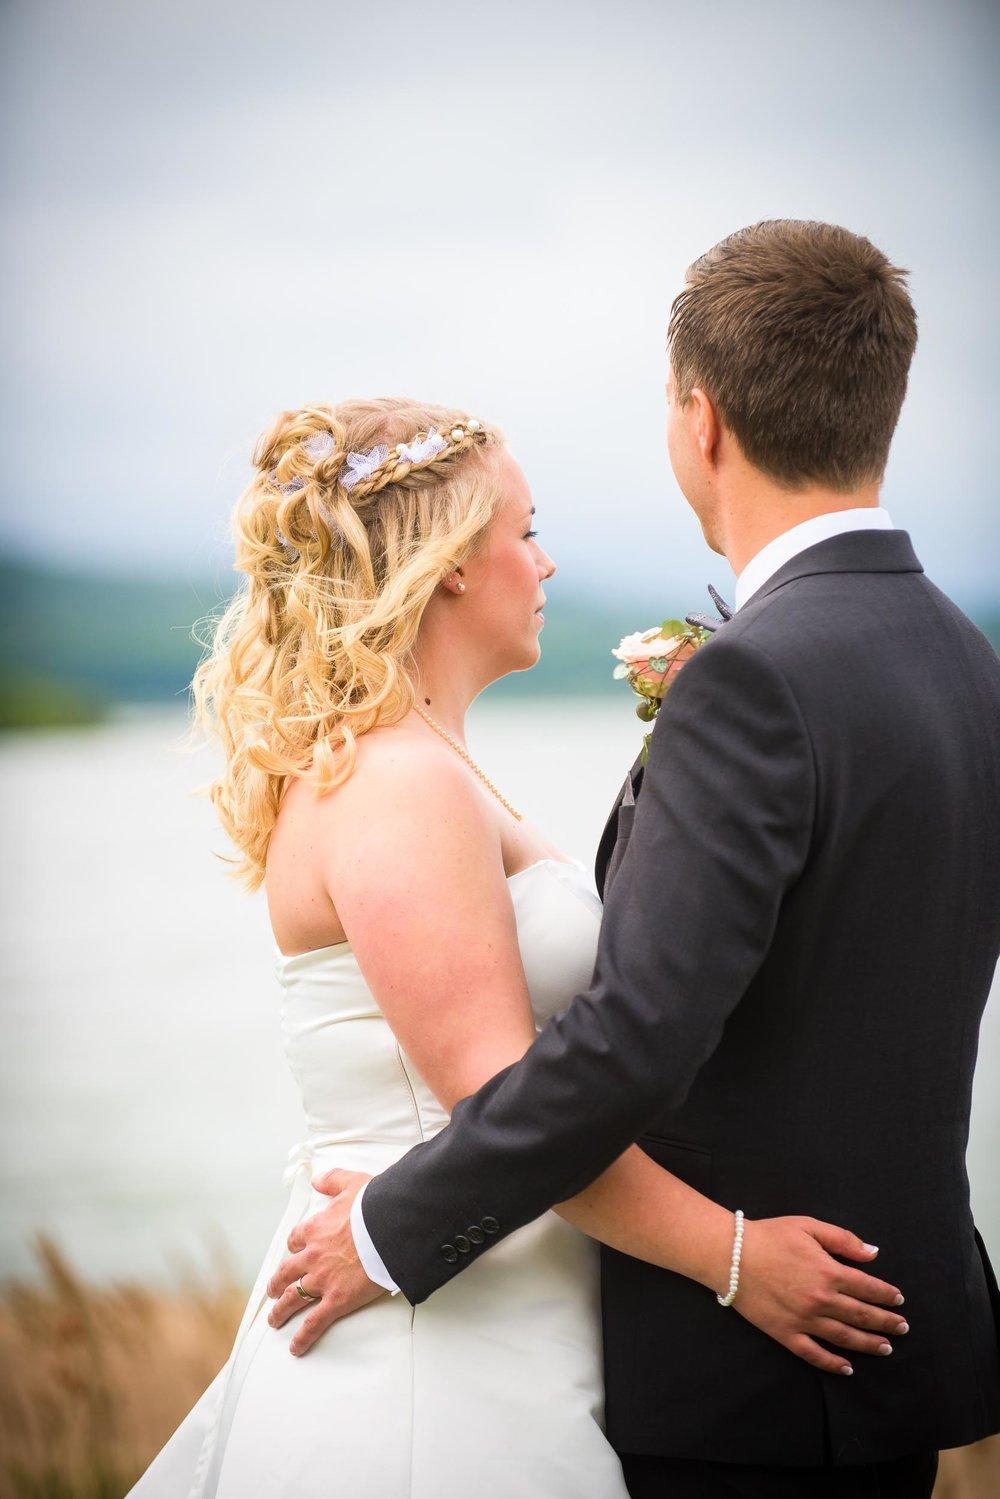 bröllopsfoto-tyringe-aug17-3.jpg